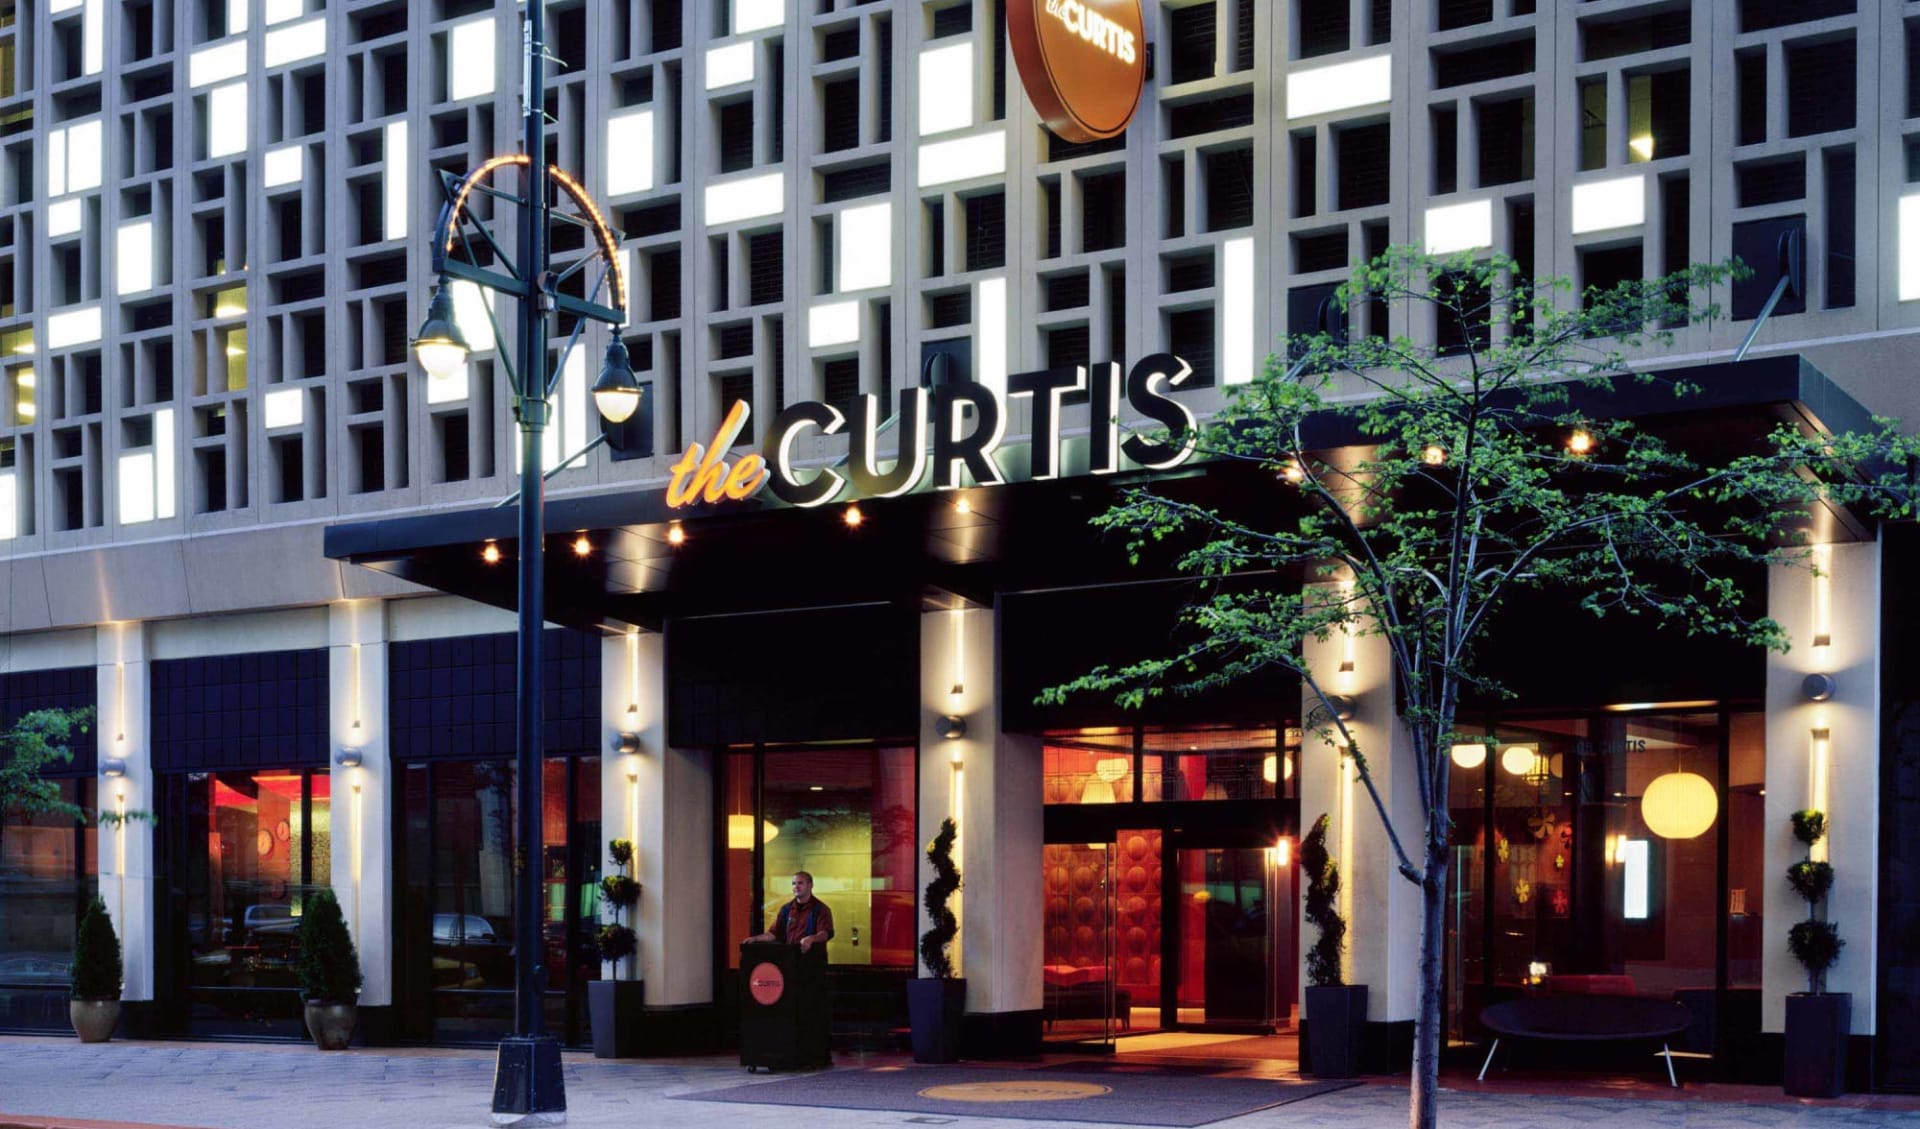 The Curtis Denver A DoubleTree by Hilton Hotel:  The Curtis - Aussenansicht bei Nacht